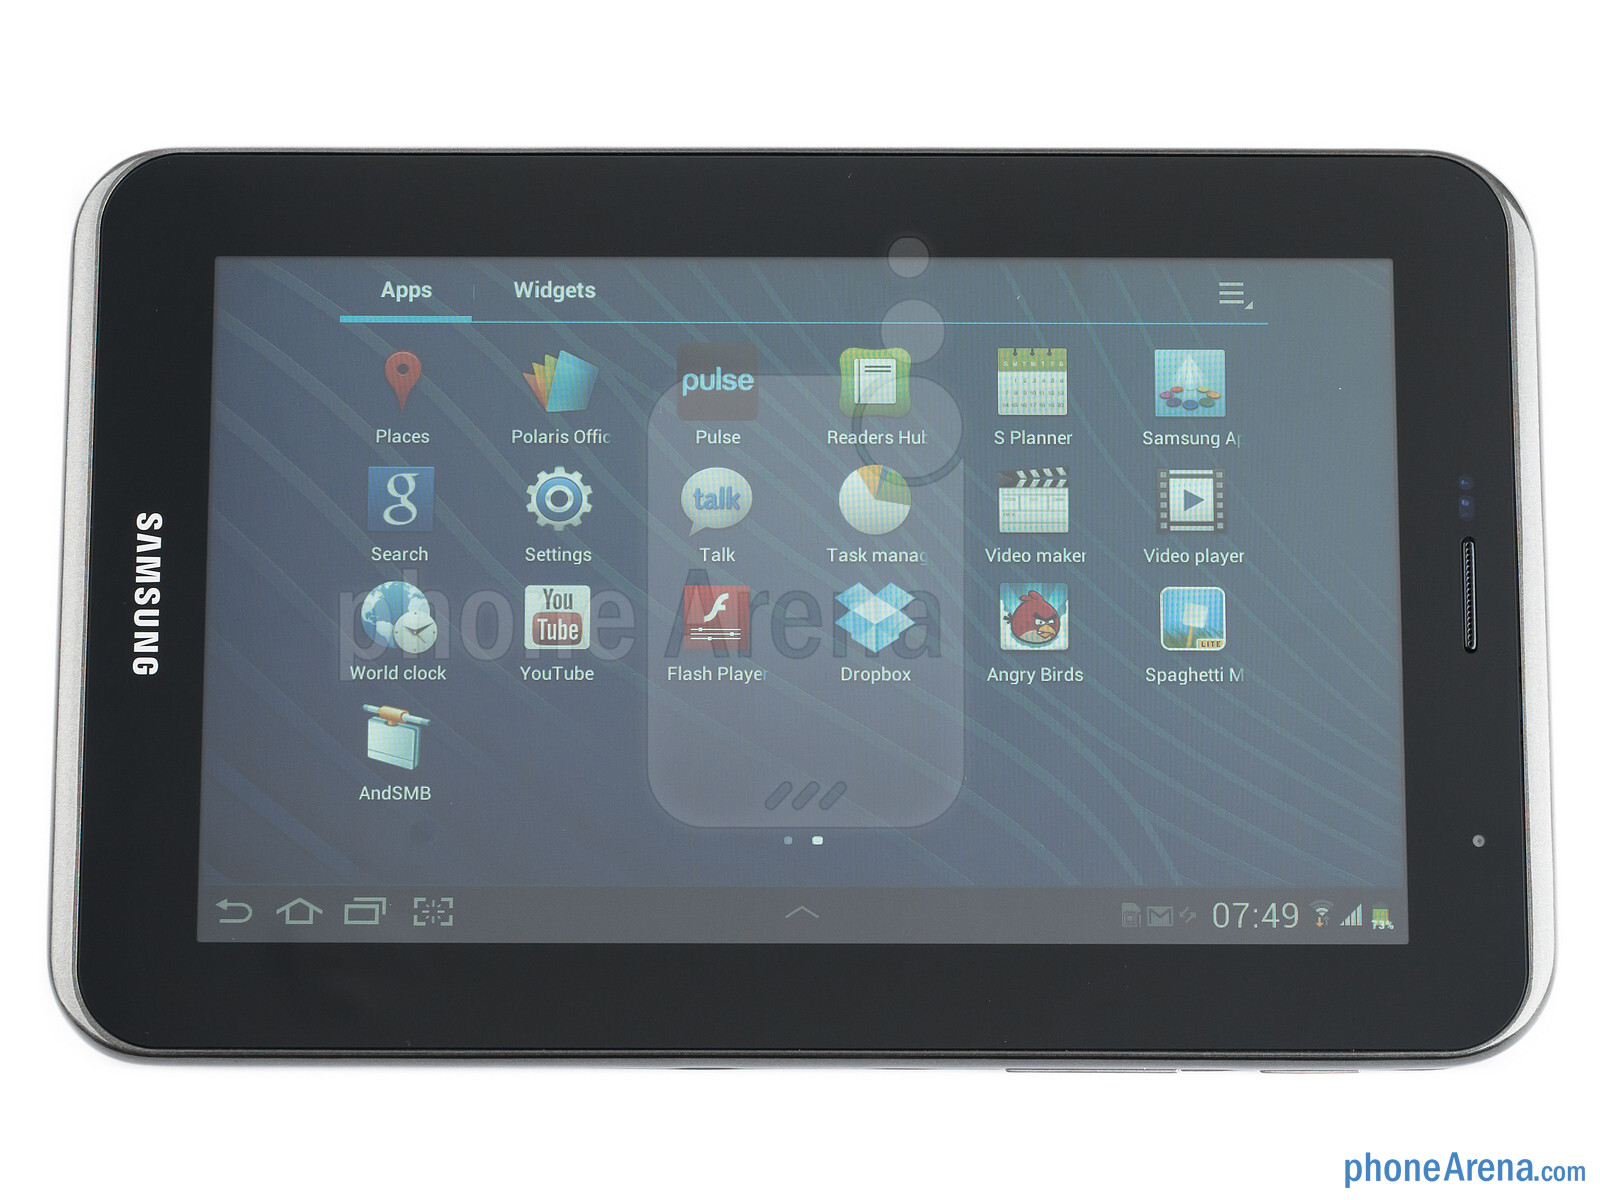 samsung galaxy tab 2 7 0 preview rh phonearena com samsung ce0168 mobile phone user manual samsung tablet ce0168 instruction manual